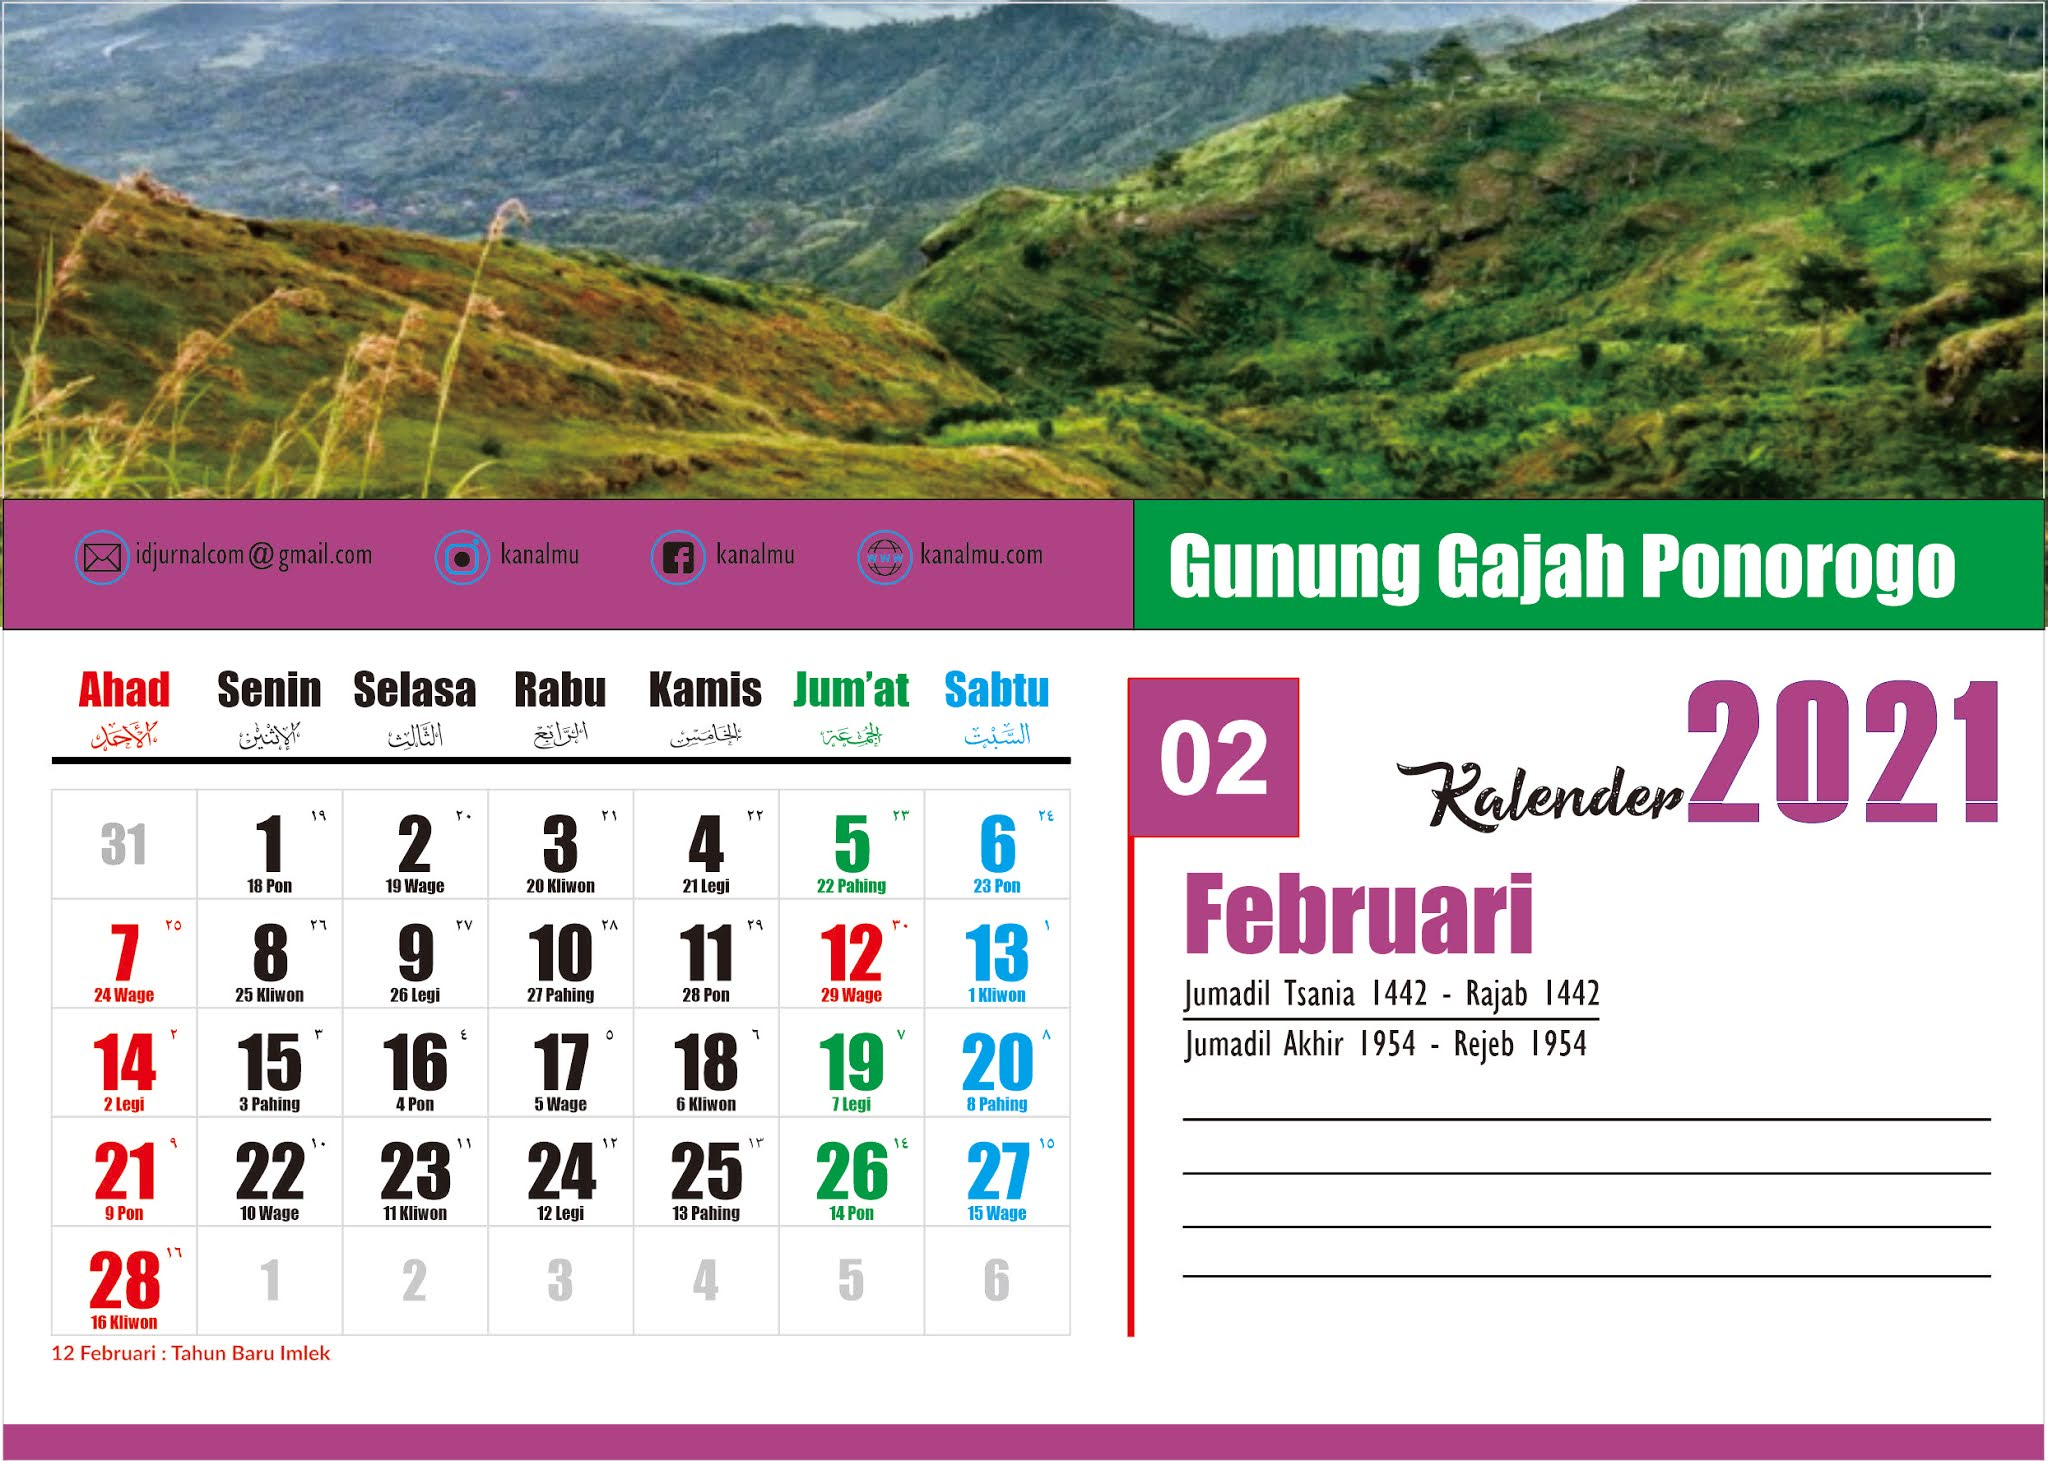 Desain Kalender 2021 : Template Desain Kalender Dinding ...